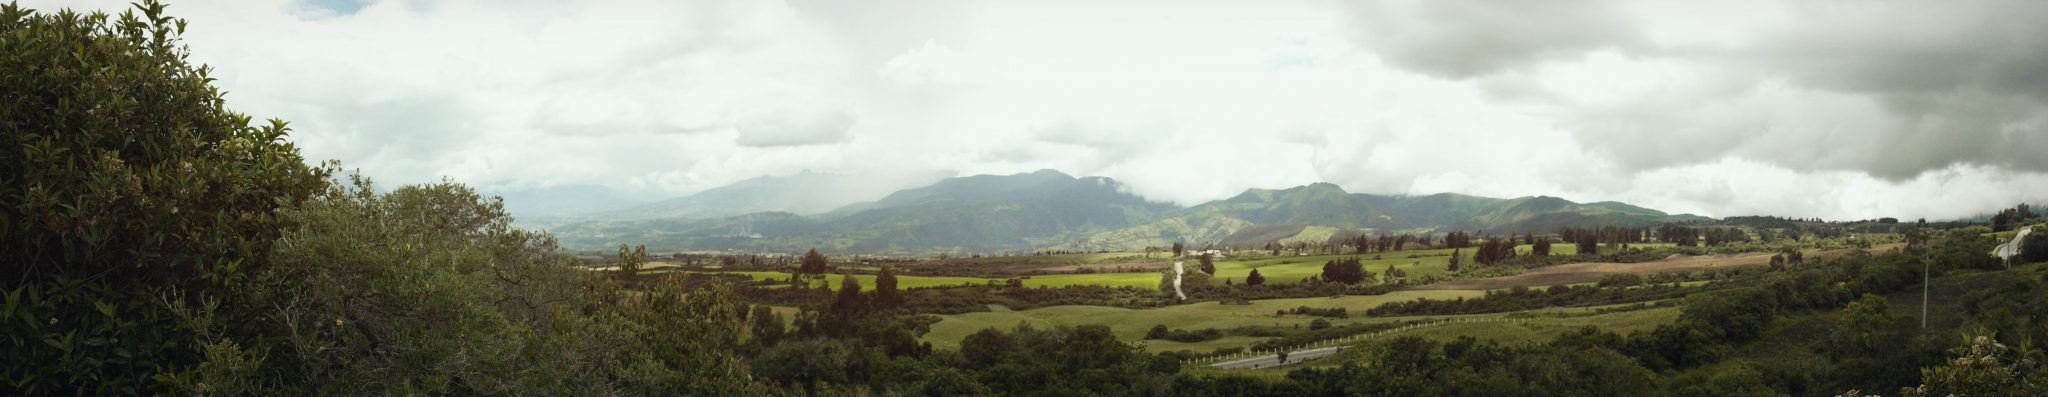 Otavalo Valey